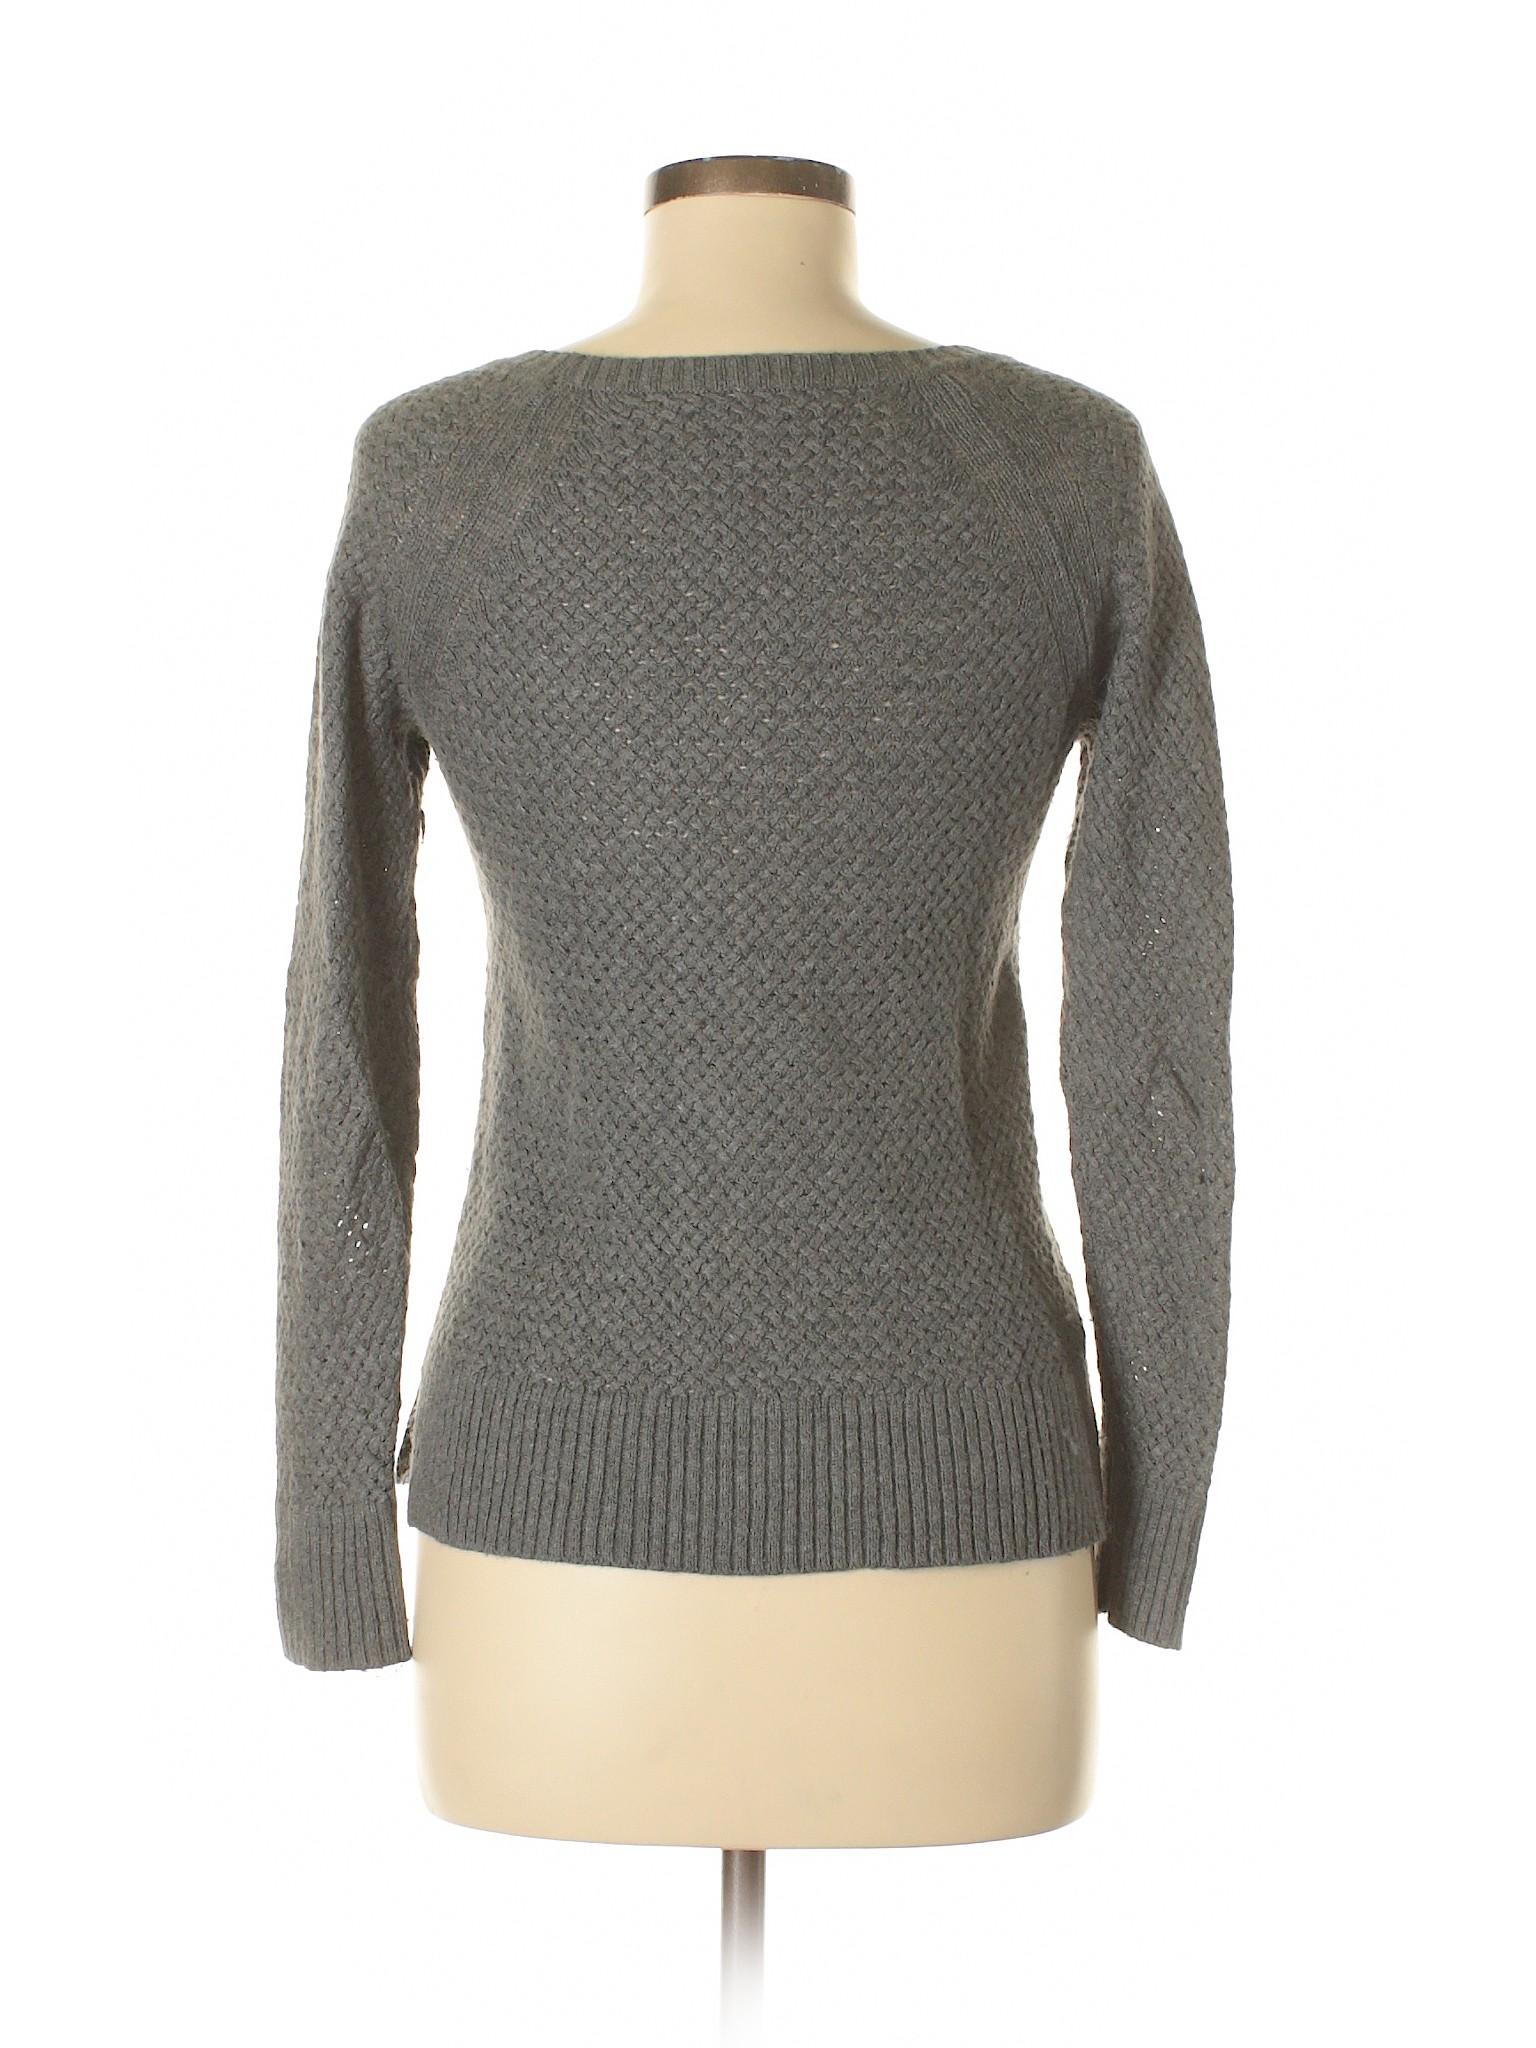 Boutique Pullover Loft Taylor Winter Sweater Ann PIwBIr